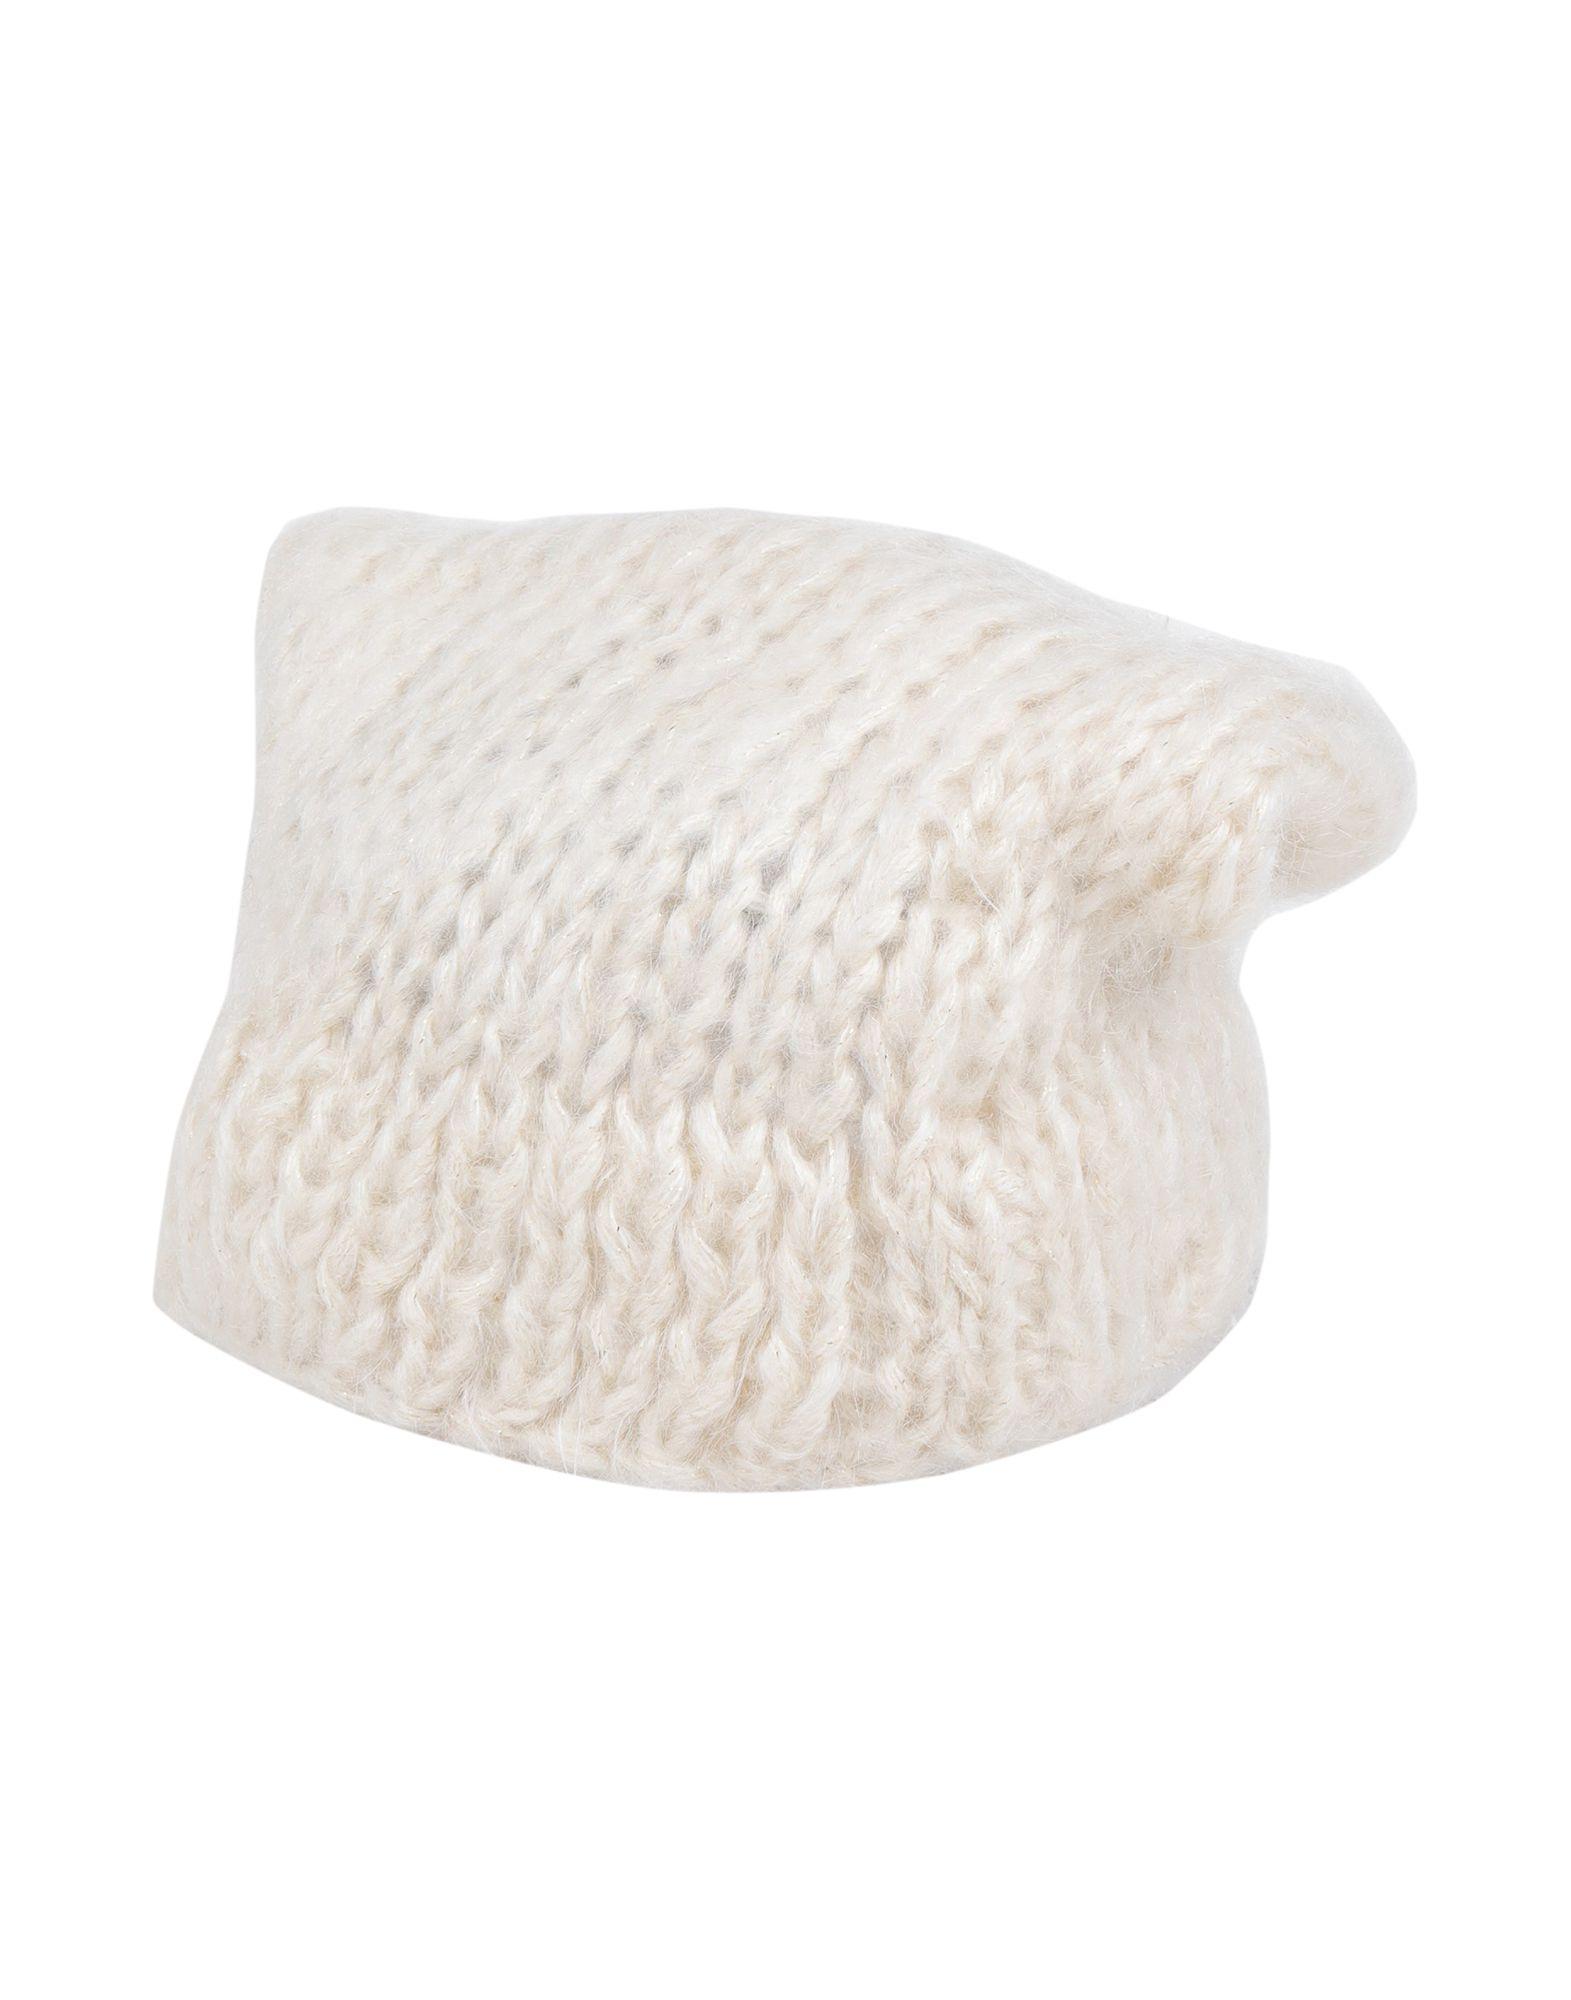 473316fca9e Mes Demoiselles Hat - Women Mes Demoiselles Hats online on YOOX ...